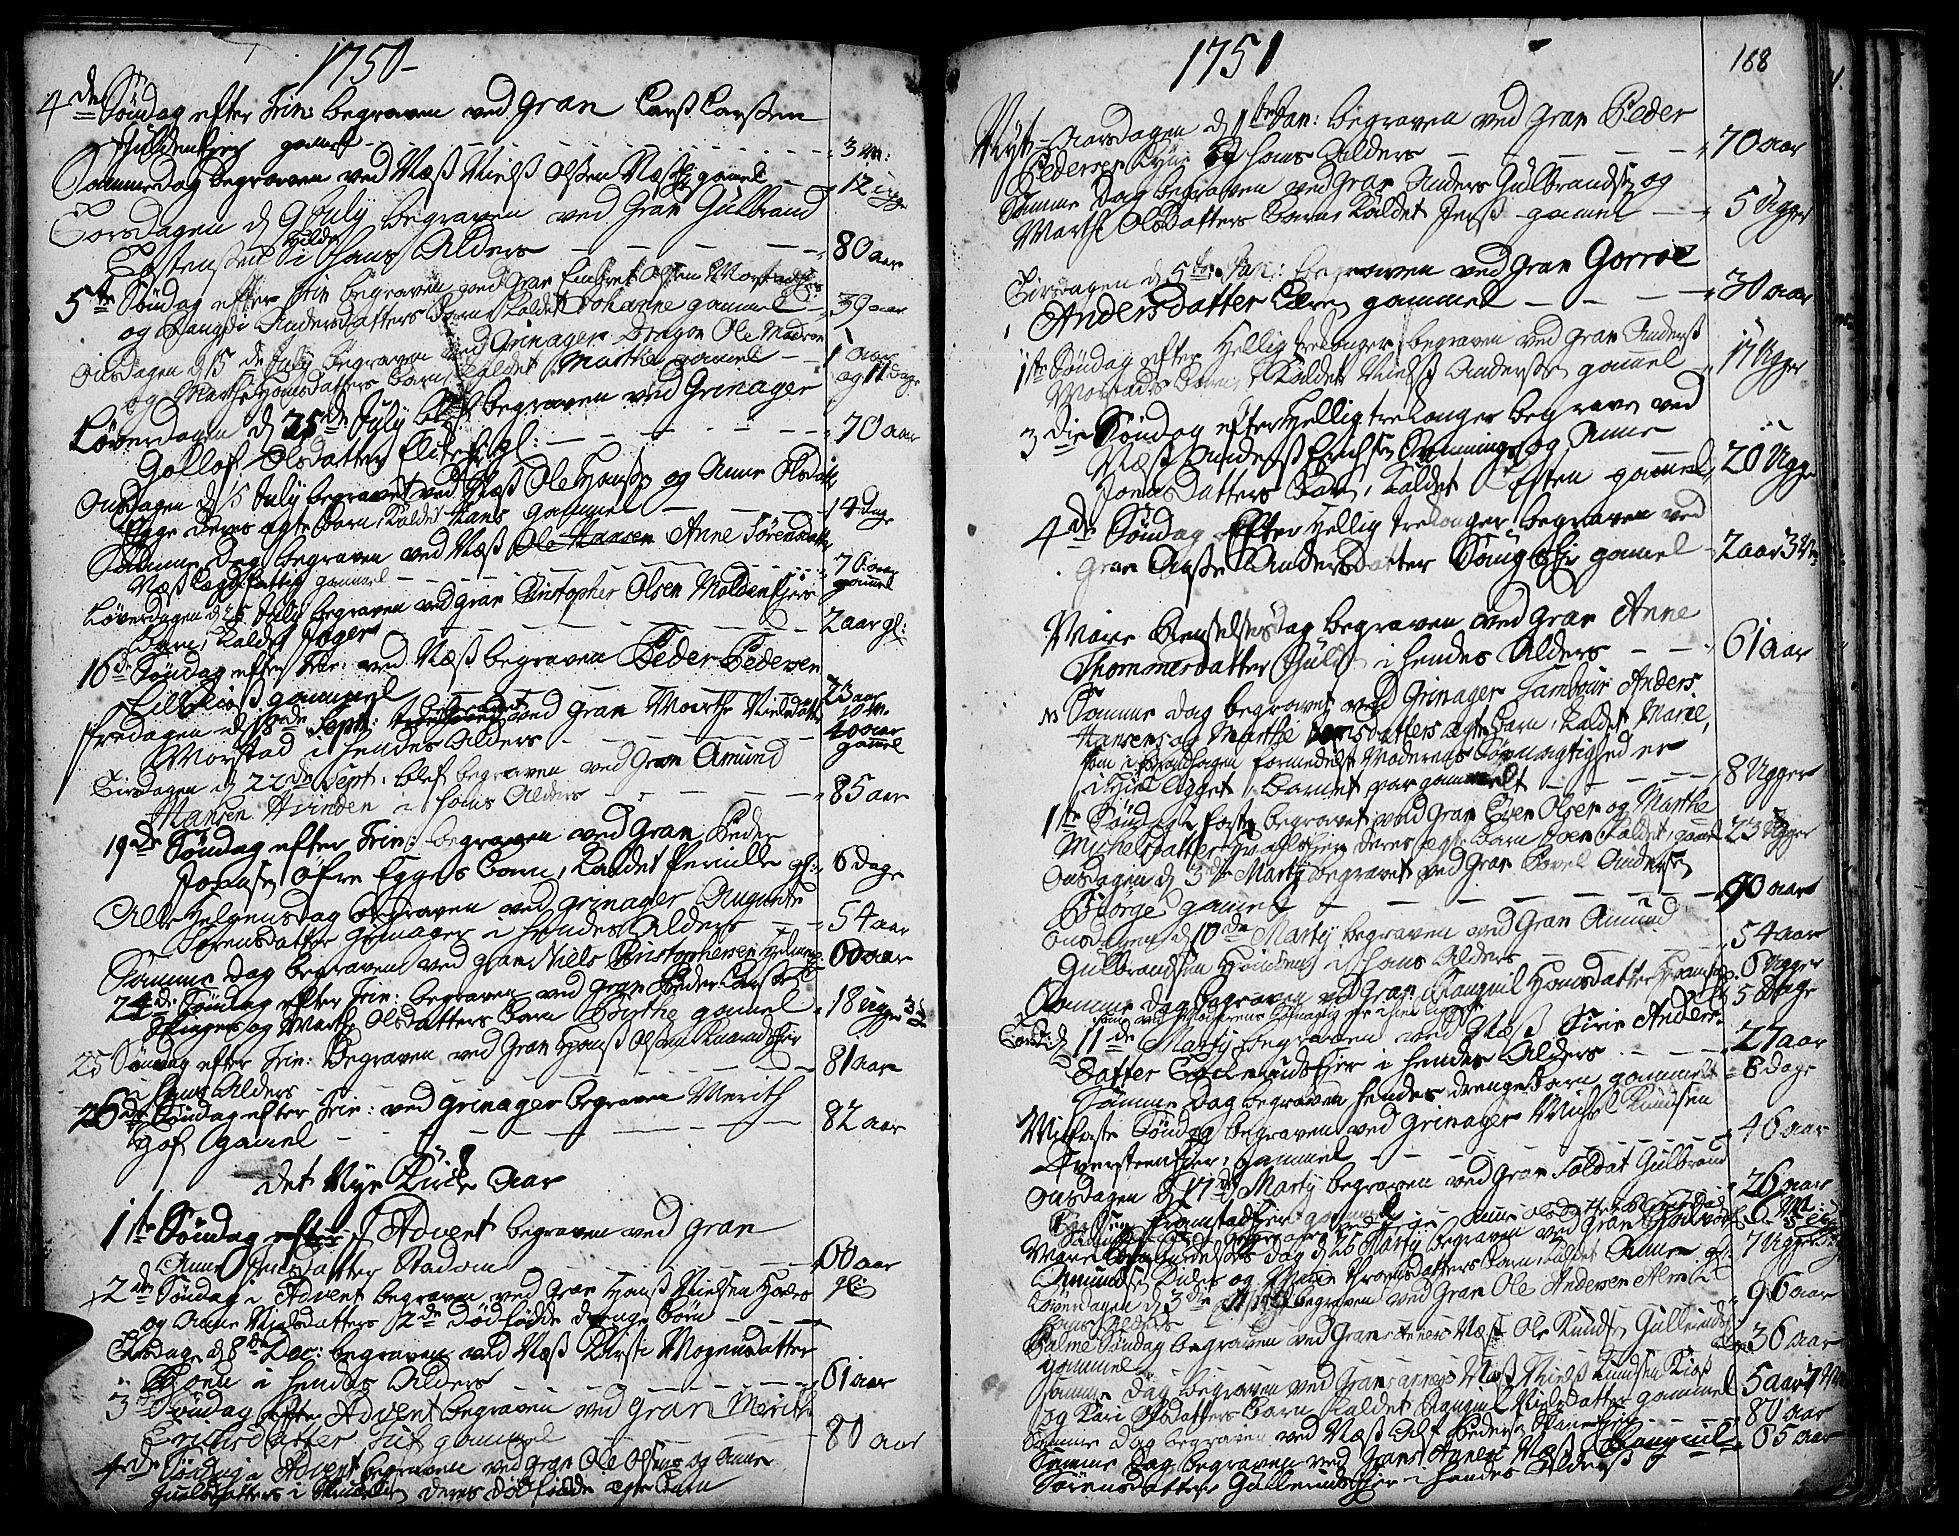 SAH, Gran prestekontor, Ministerialbok nr. 3, 1745-1758, s. 188